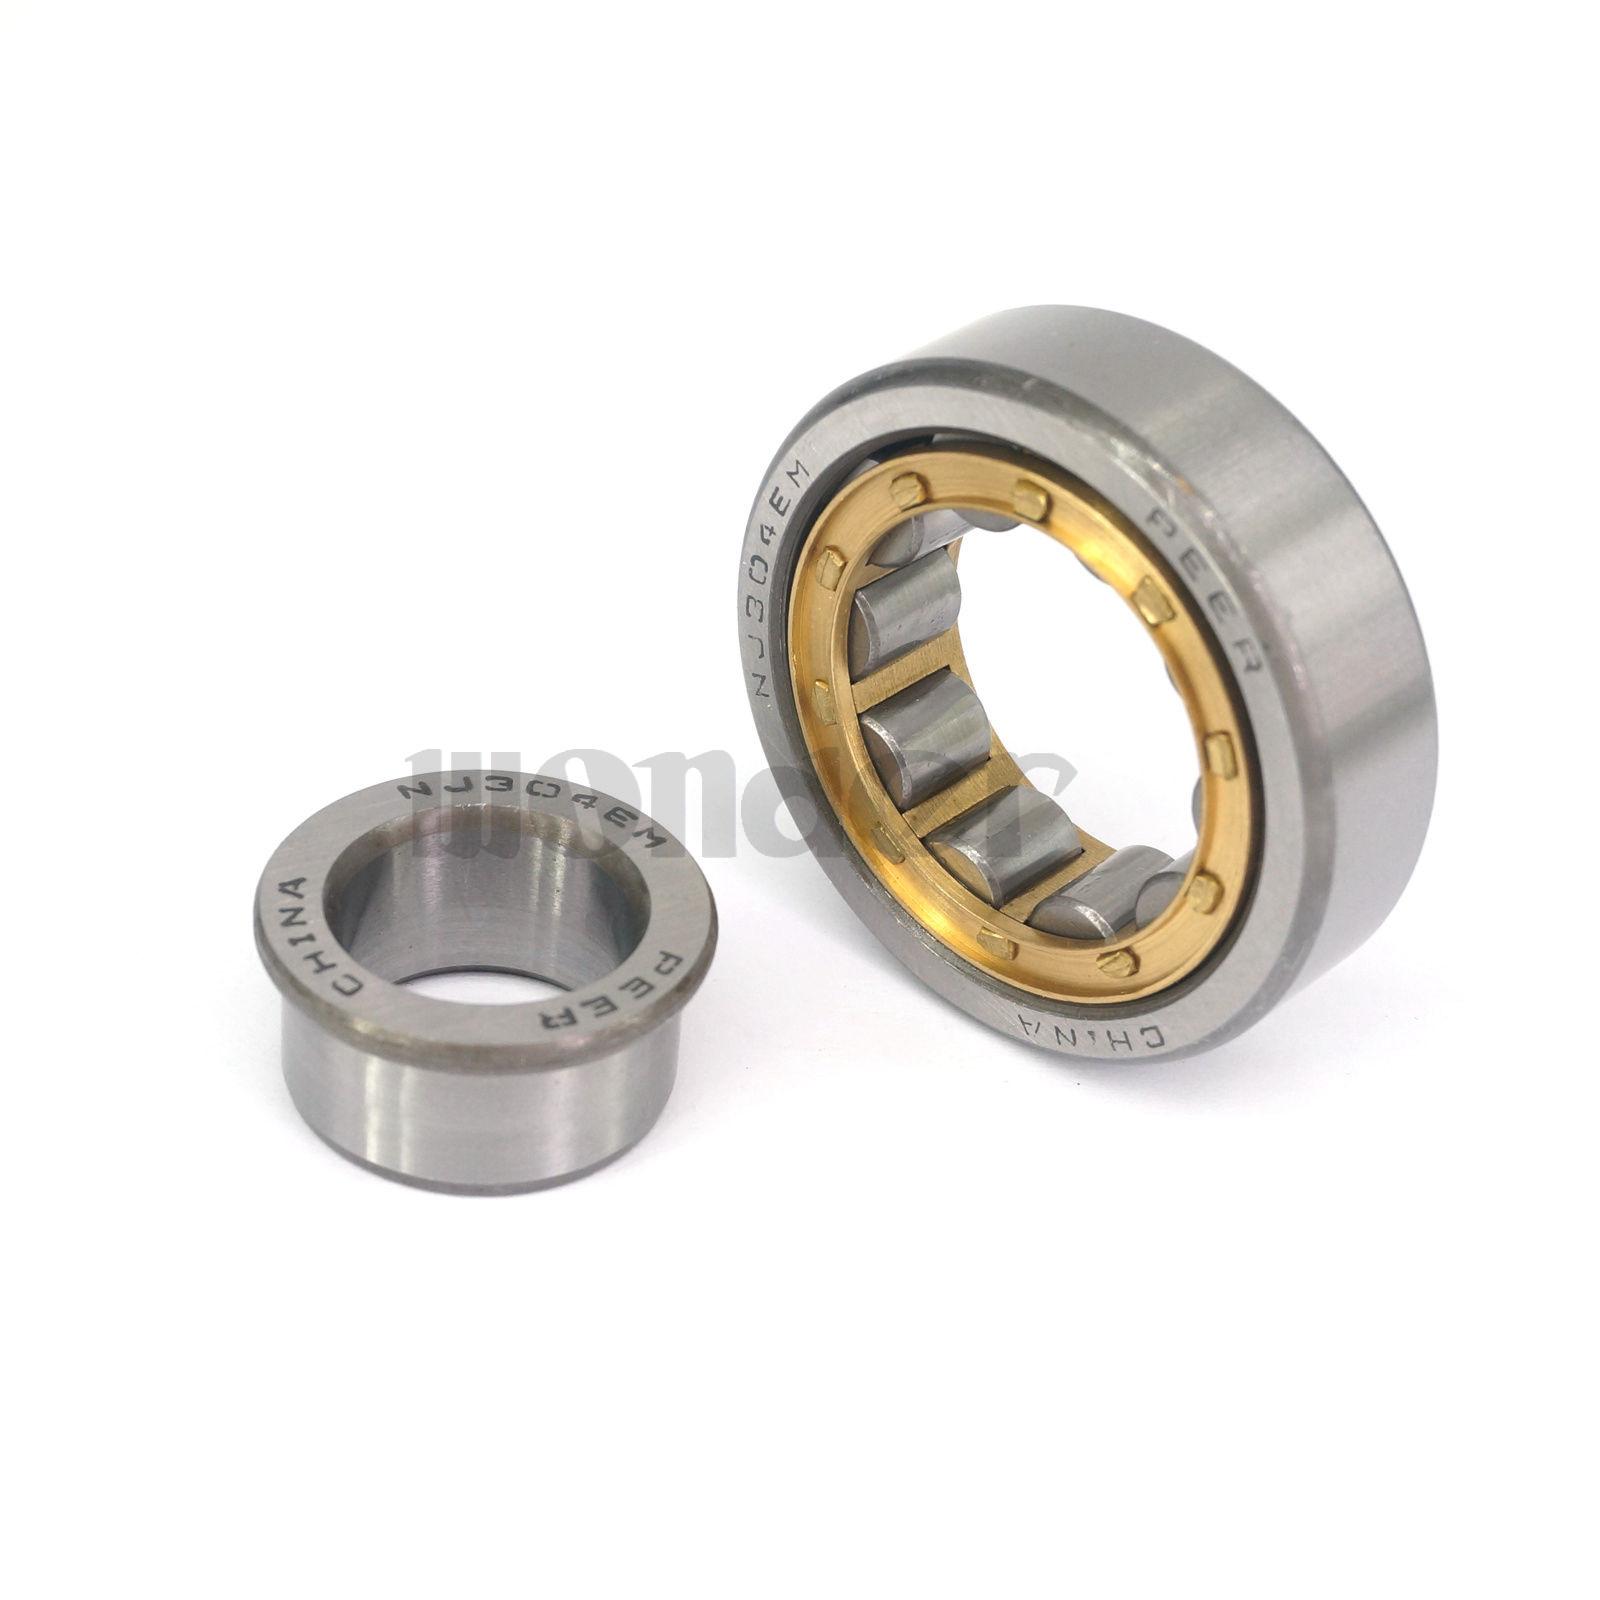 40x17x12mm NJ203EM Mechanical Bearing Steel Cylindrical Roller Bearings